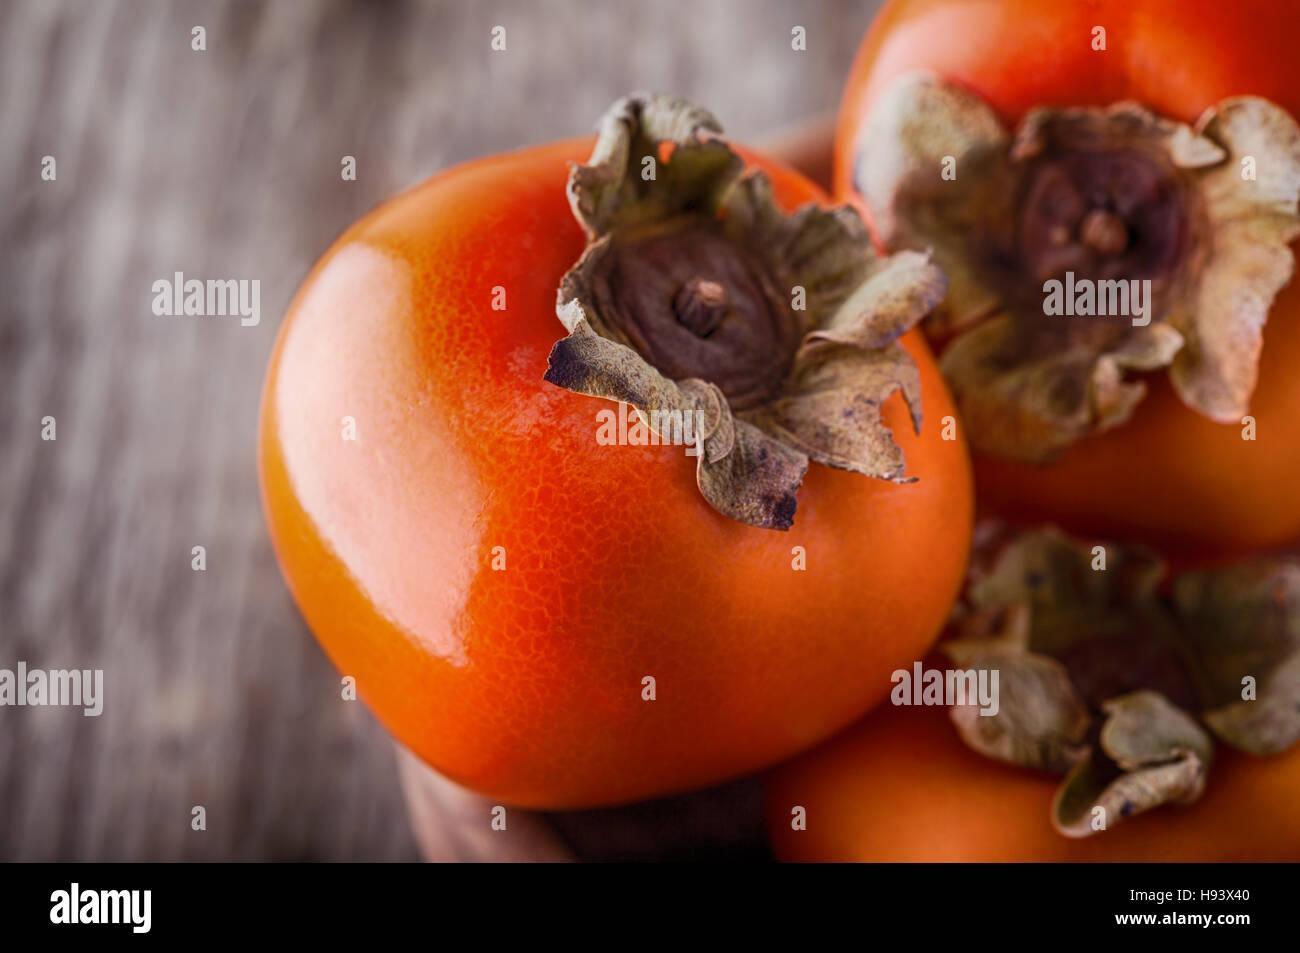 Fresh orange kaki sur une table en bois. Photo Stock